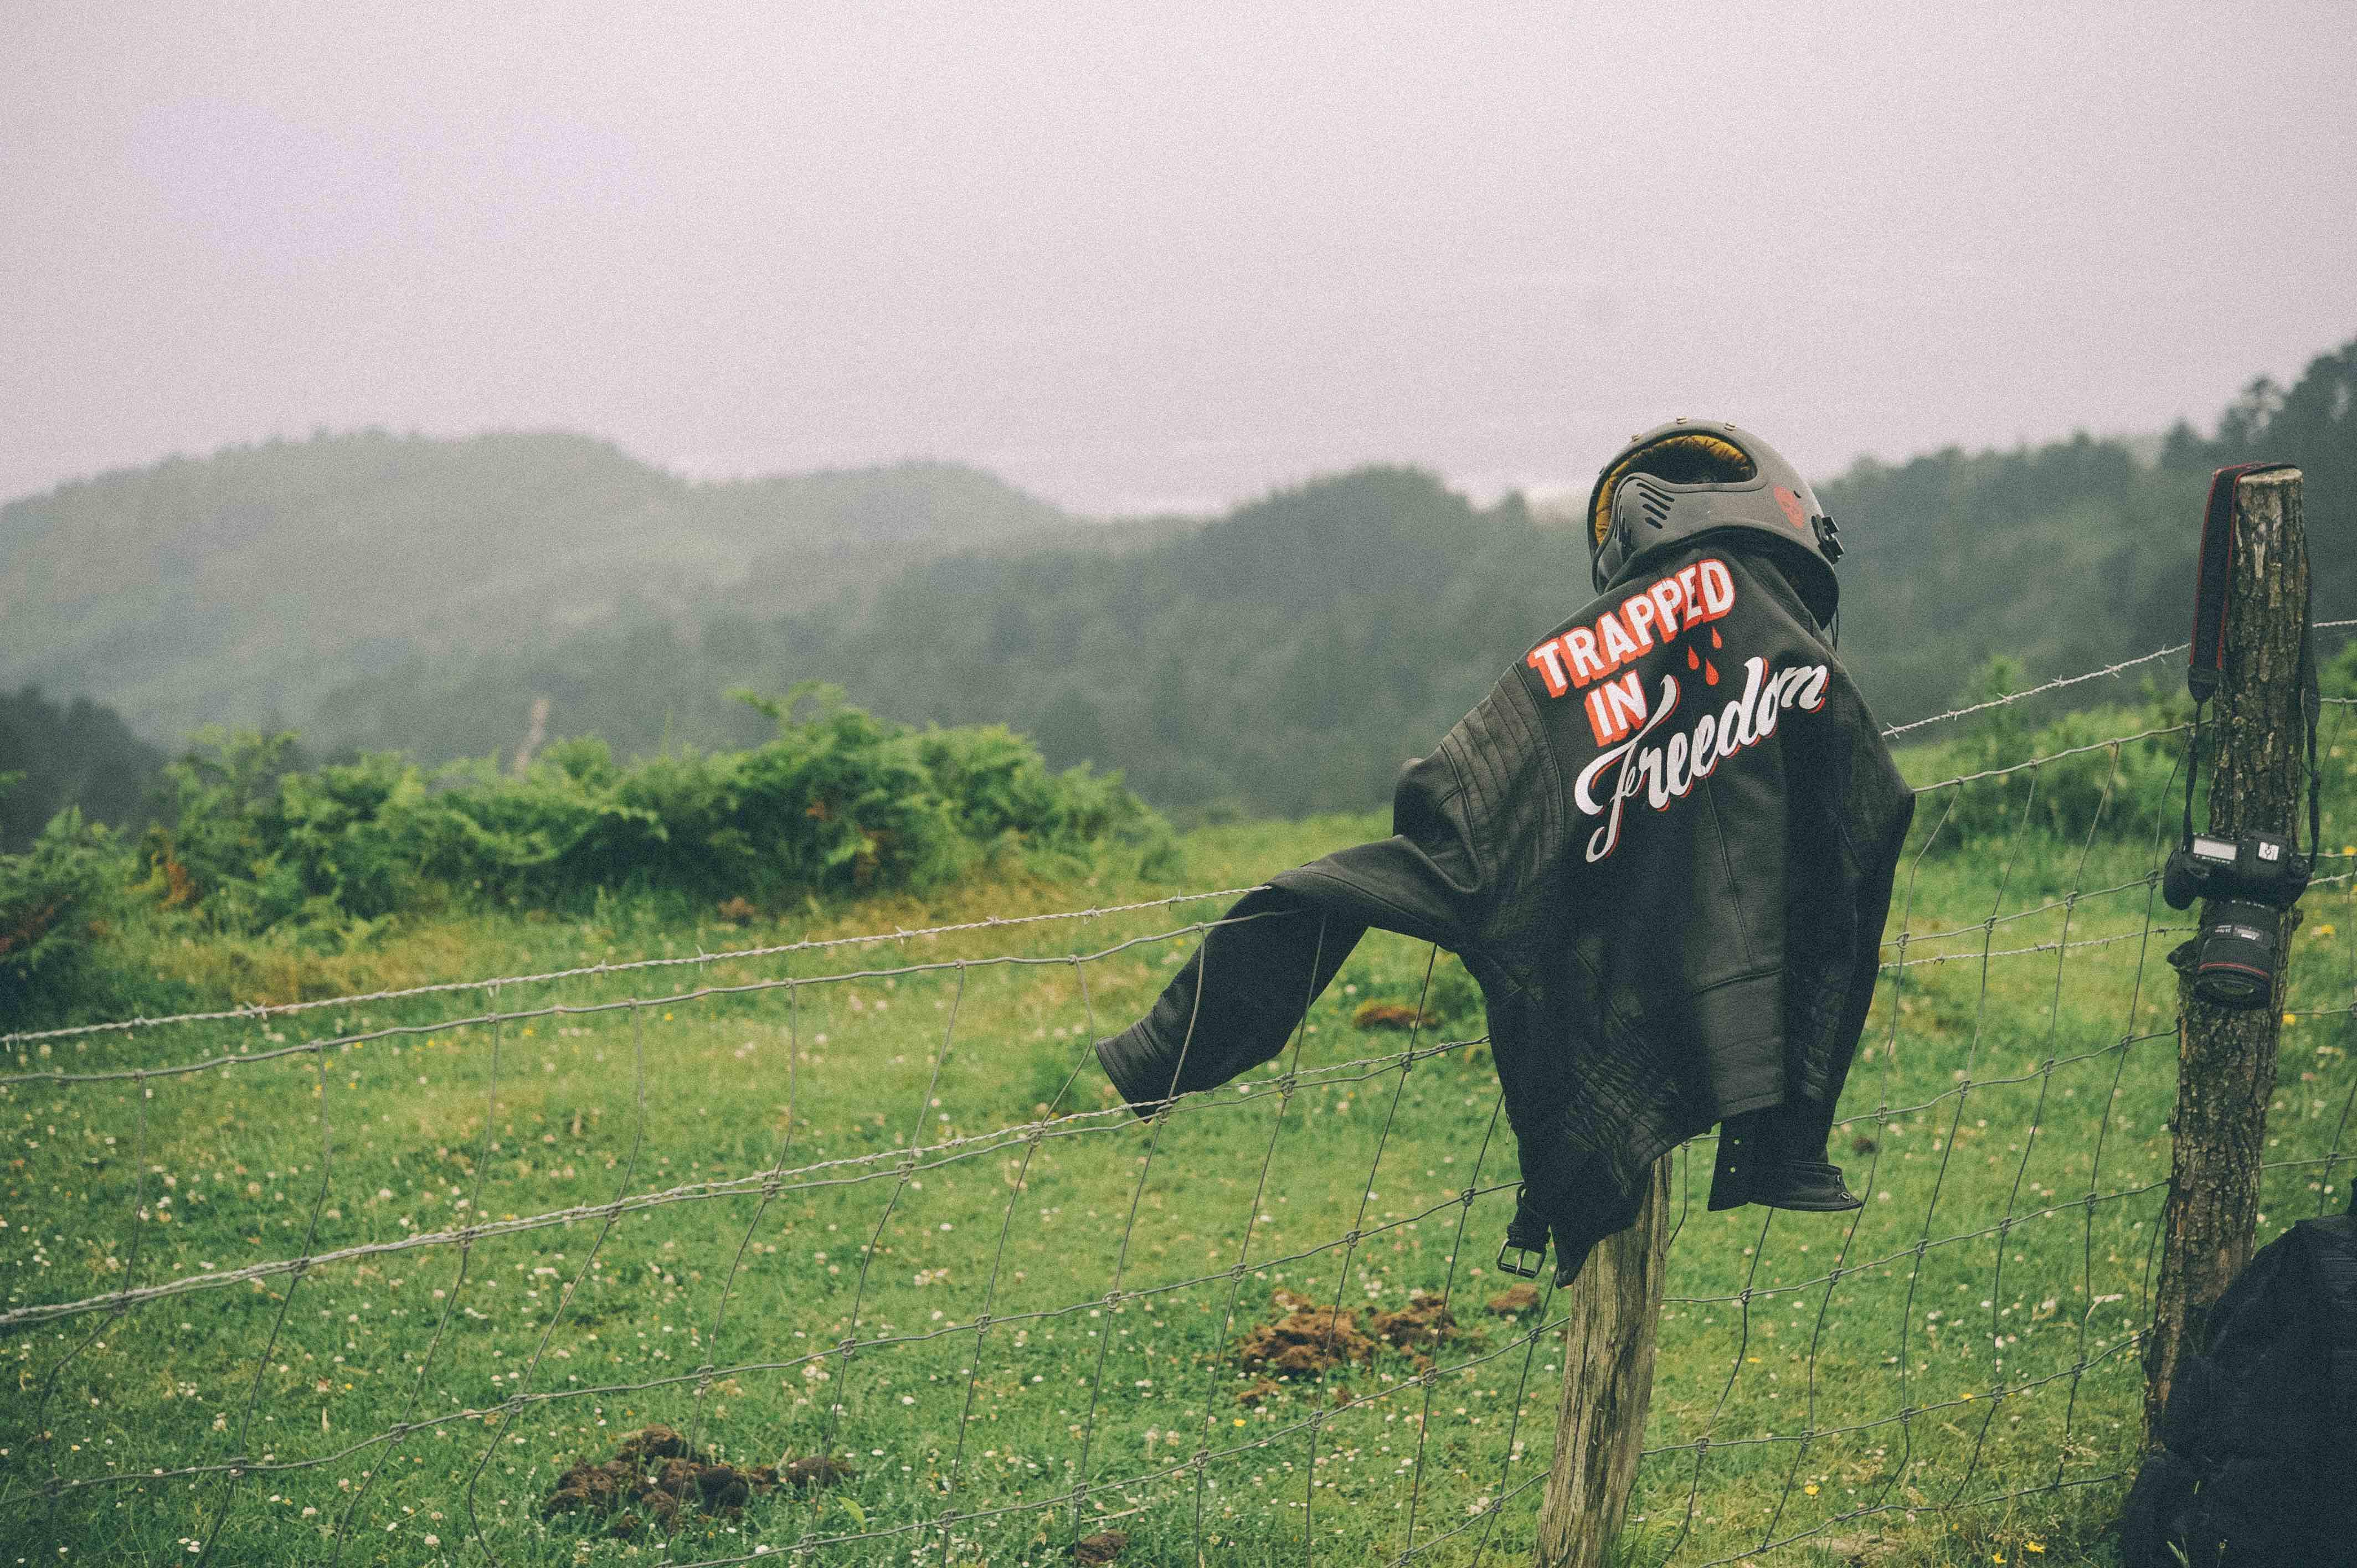 Huck-TriumphAdvertorial-PhotobyAmauryChibotWheelsWaves2017-Web5